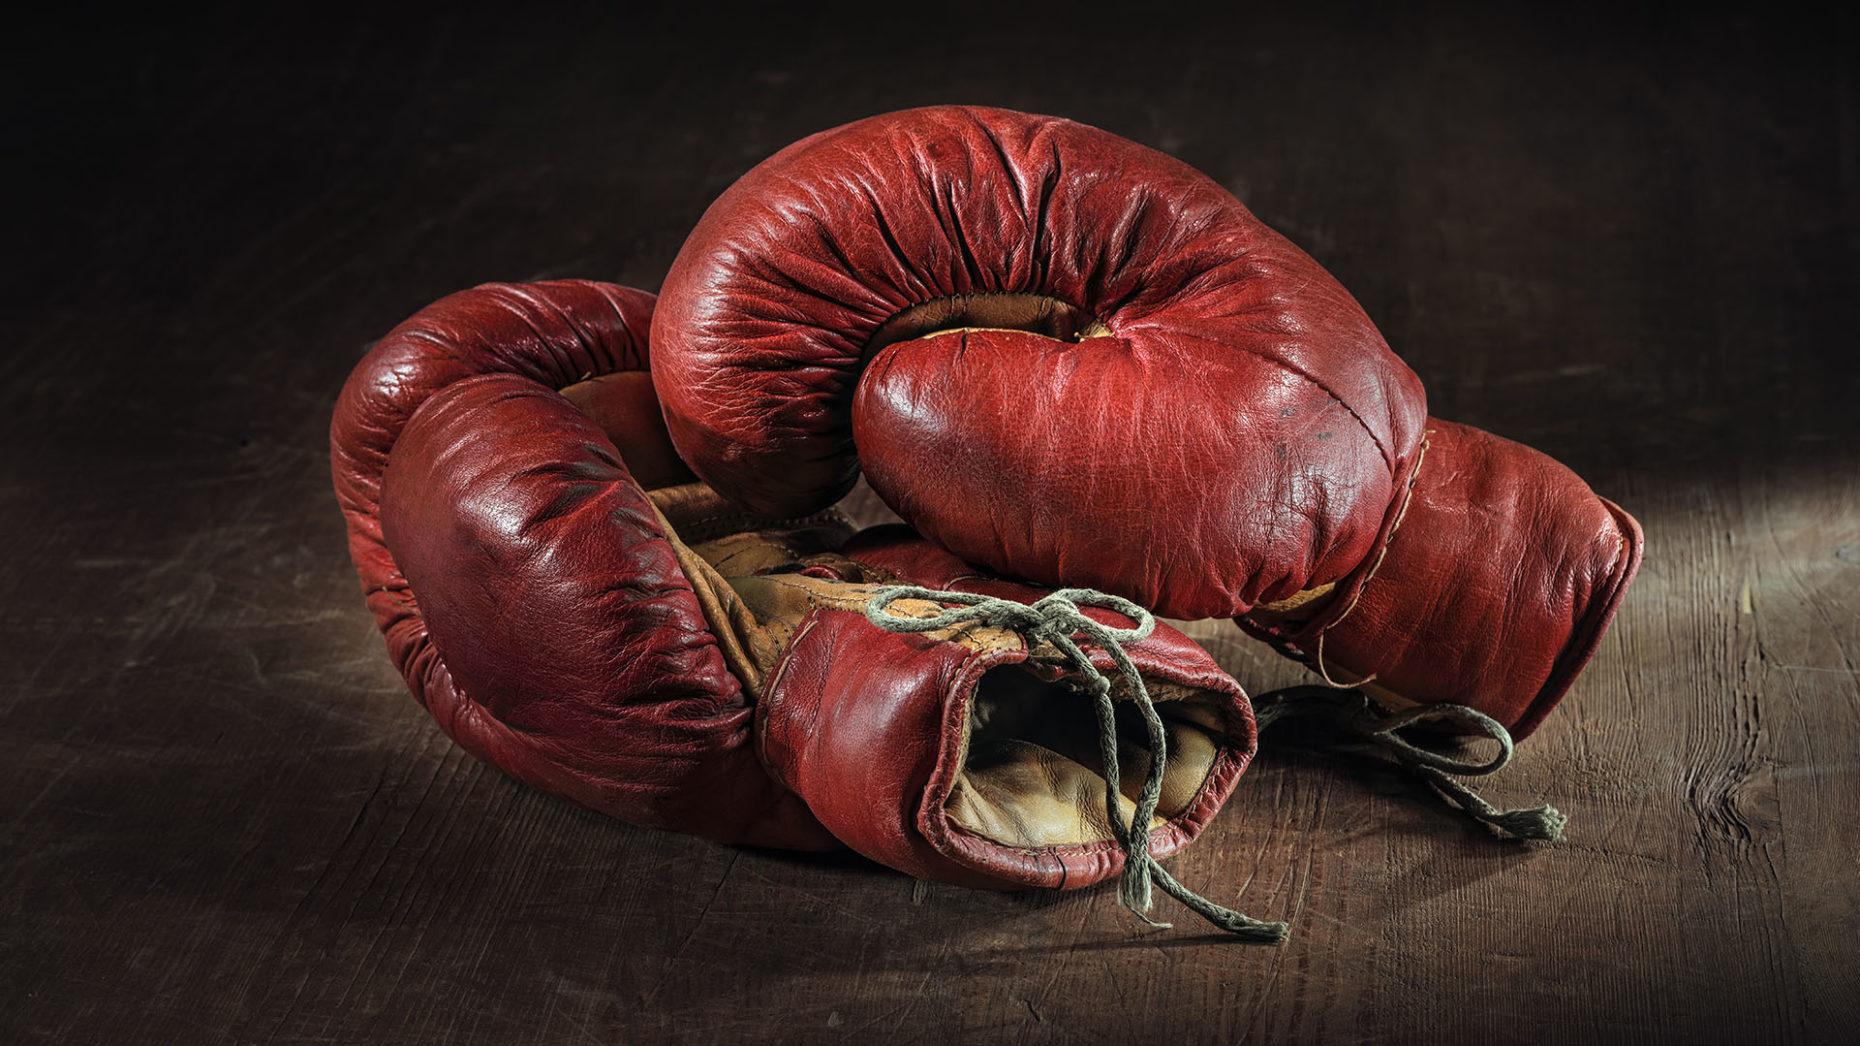 boxing_boxen_handschuh_glove_kampf_kmu_stakeholder_wirblog